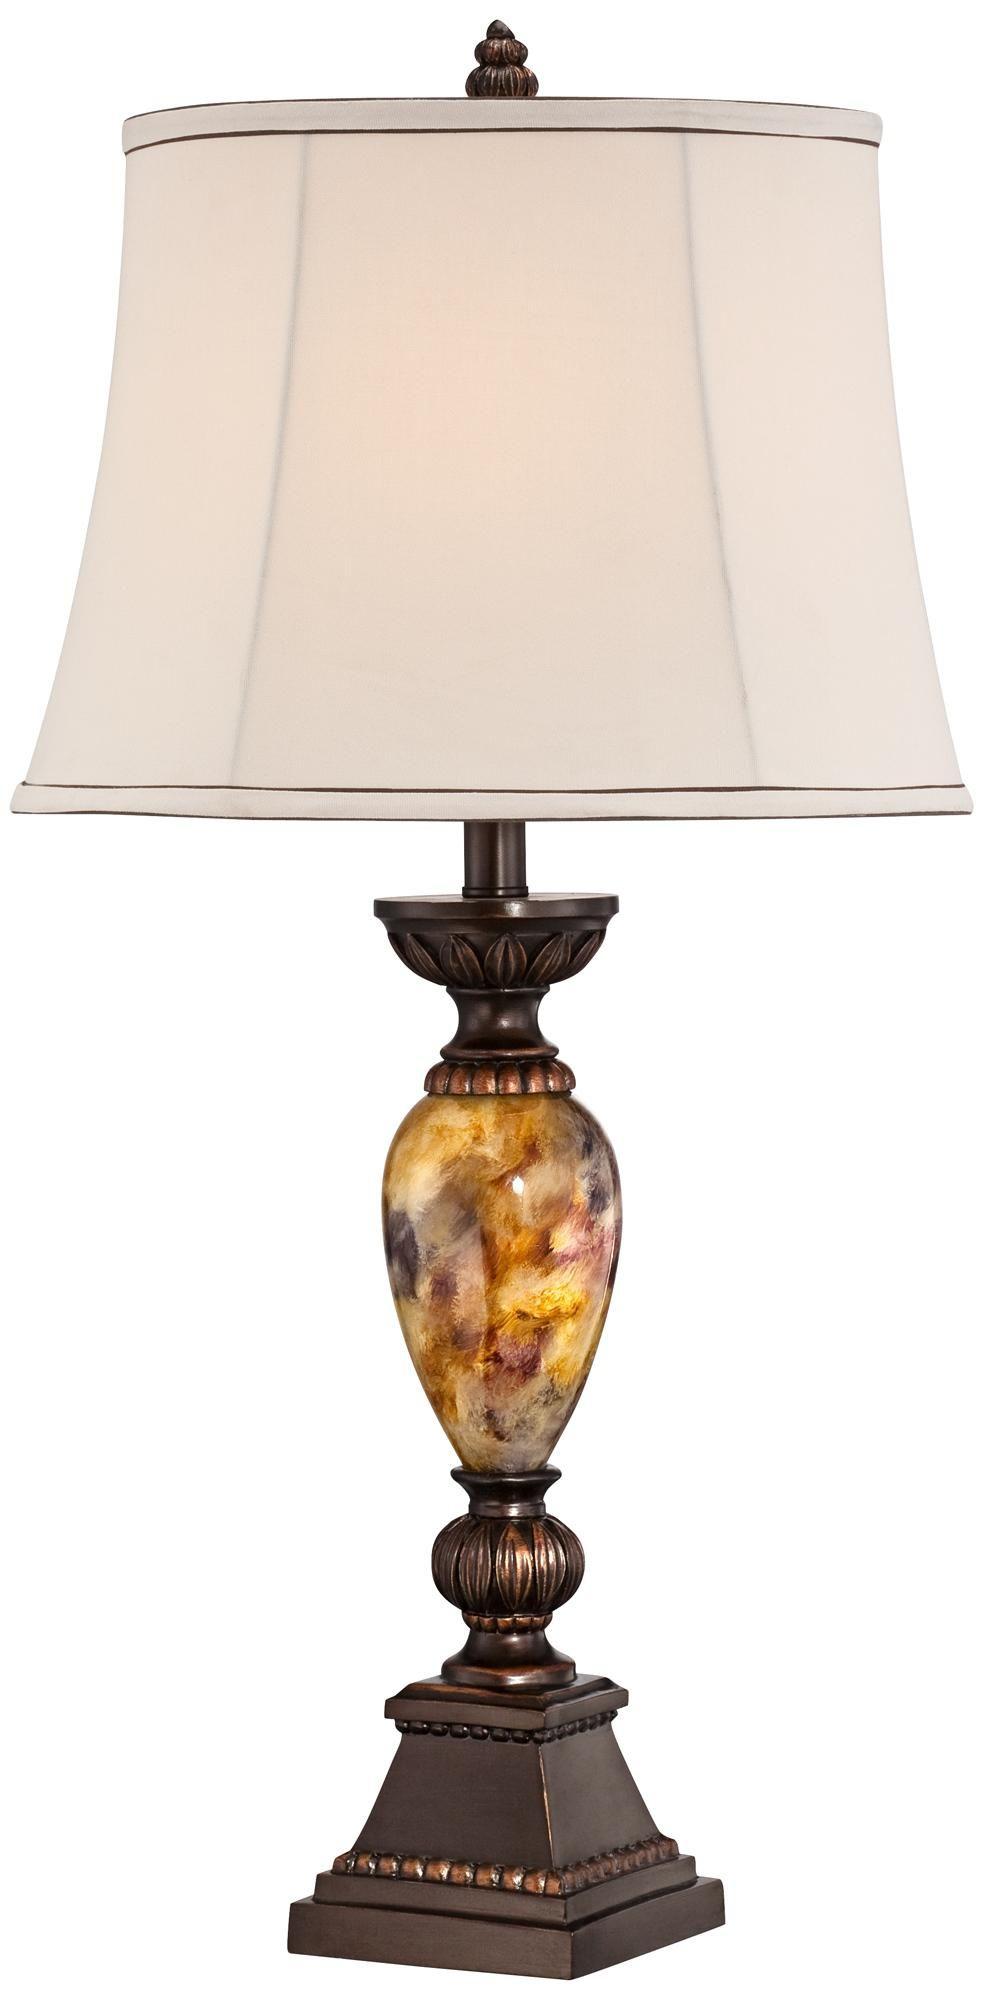 Kathy ireland home mulholland 30 marbleized table lamp